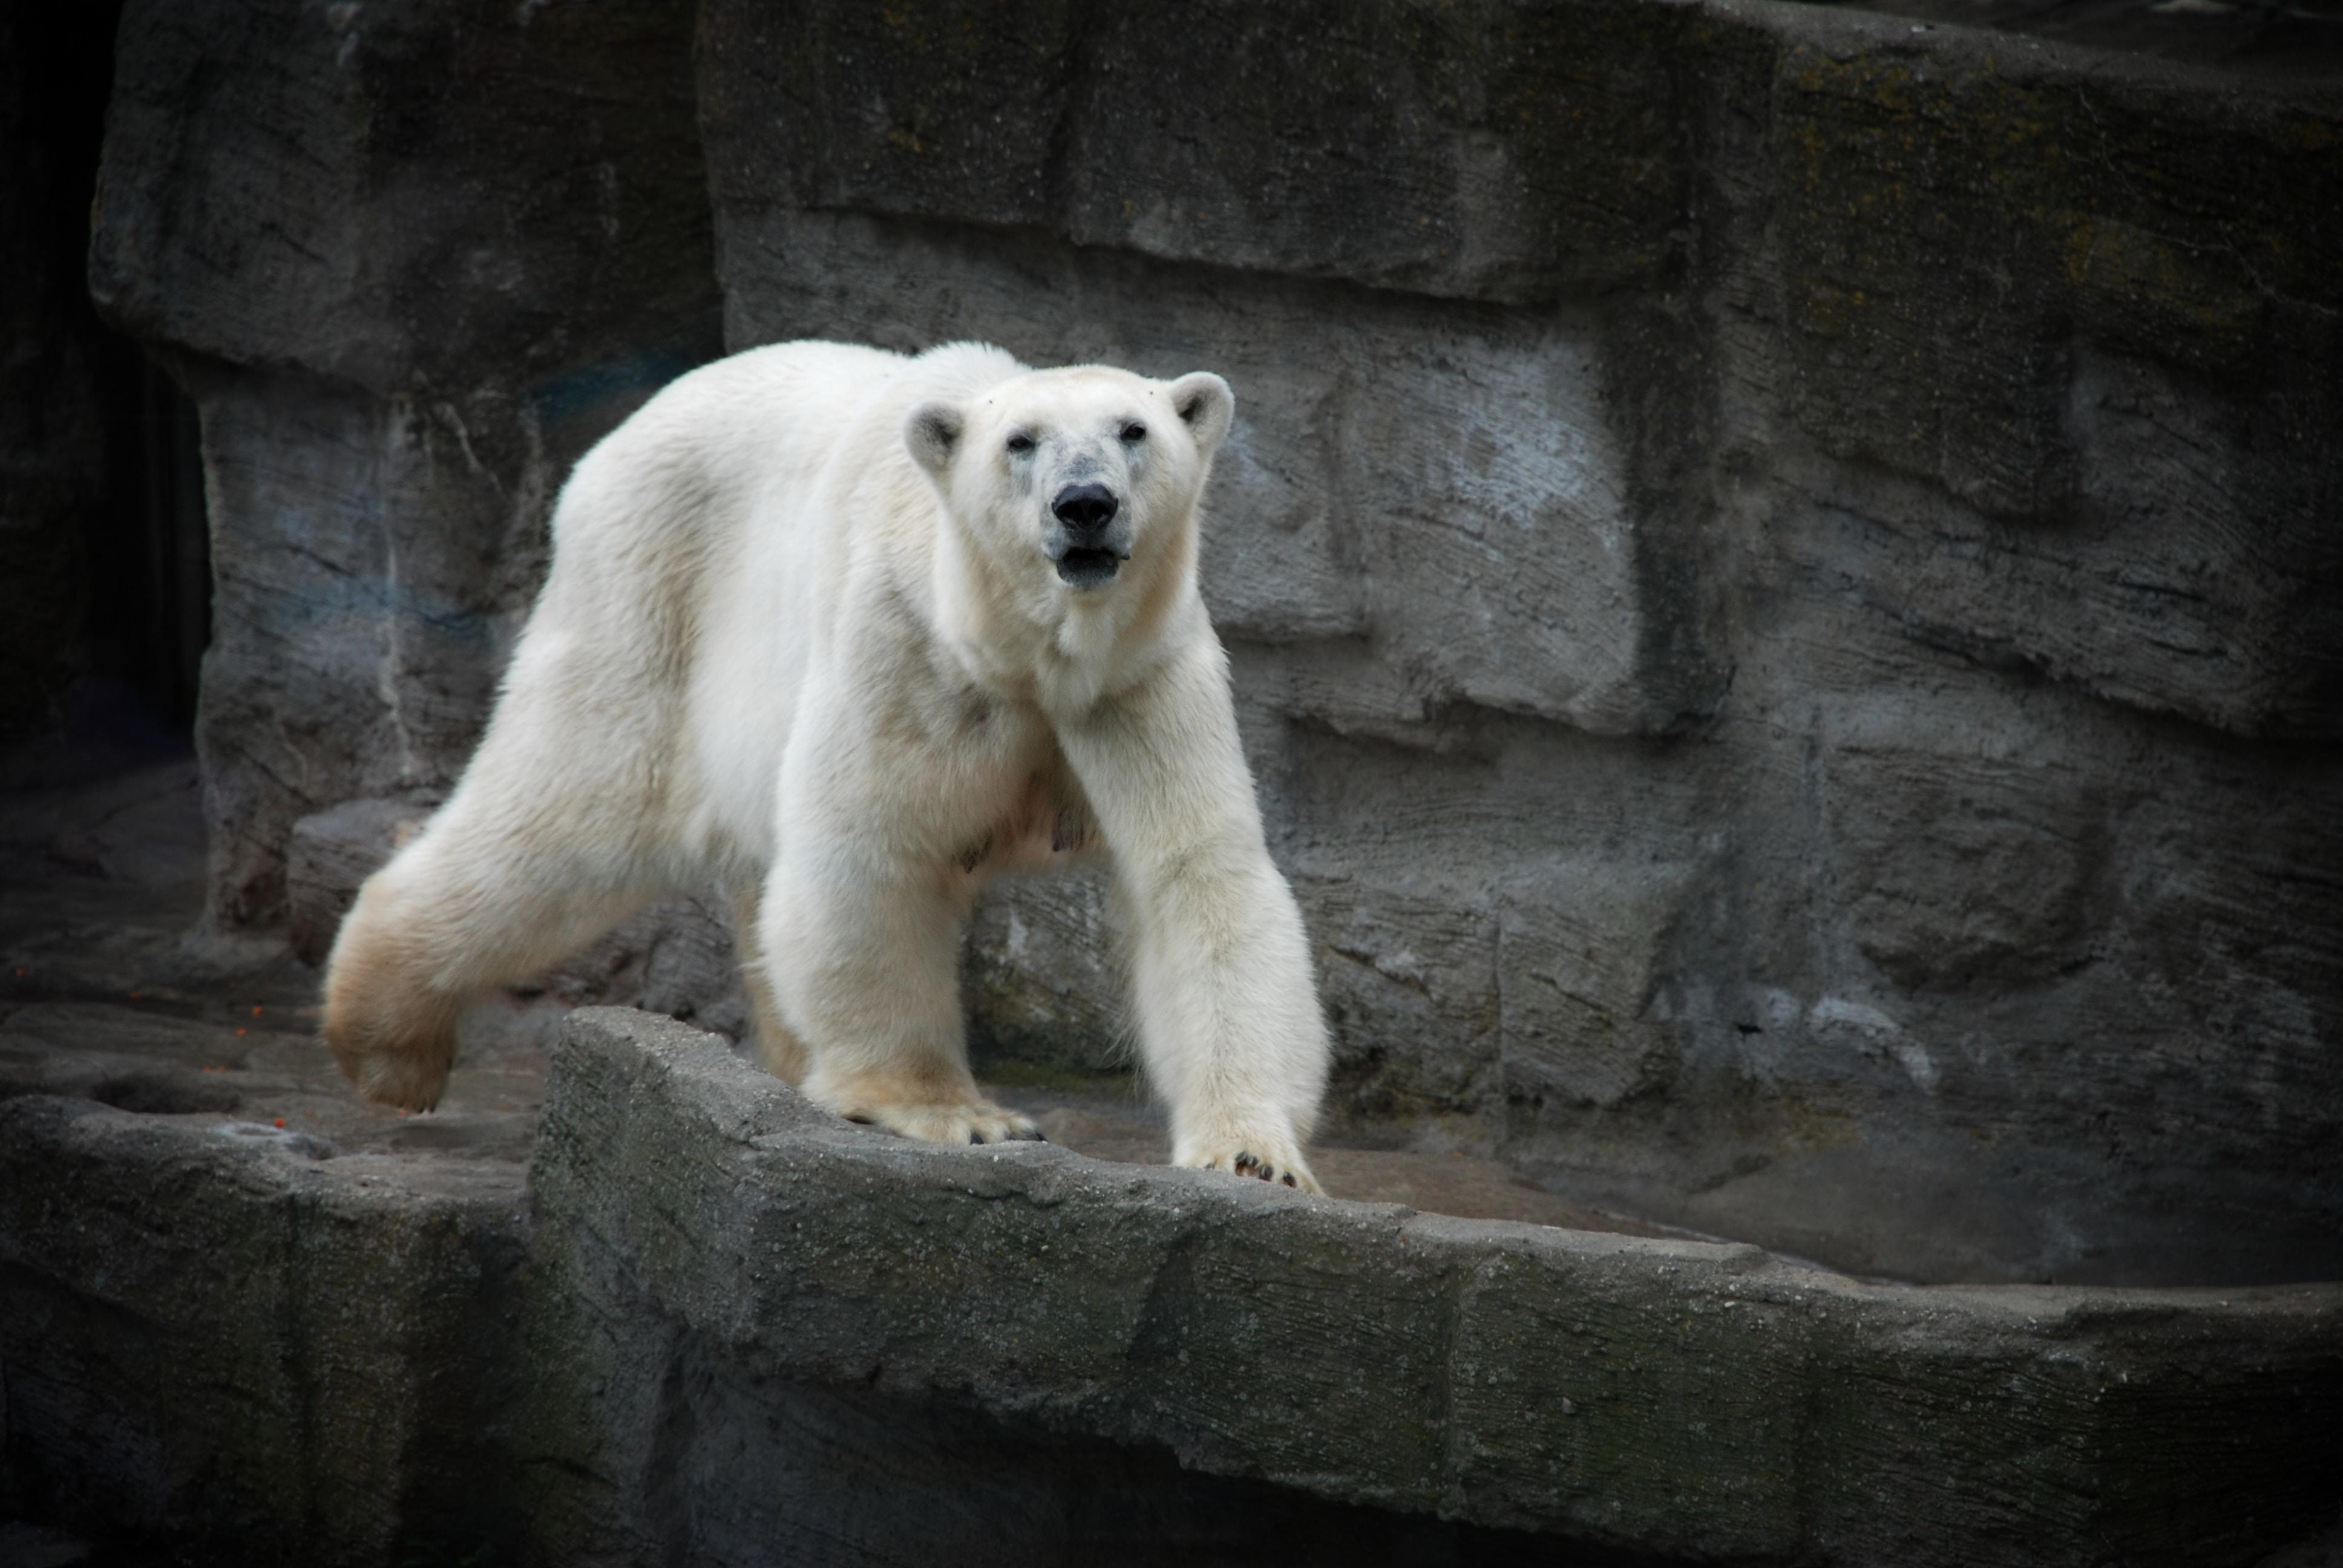 A view of a white furry polar bear walking on a stony cliff